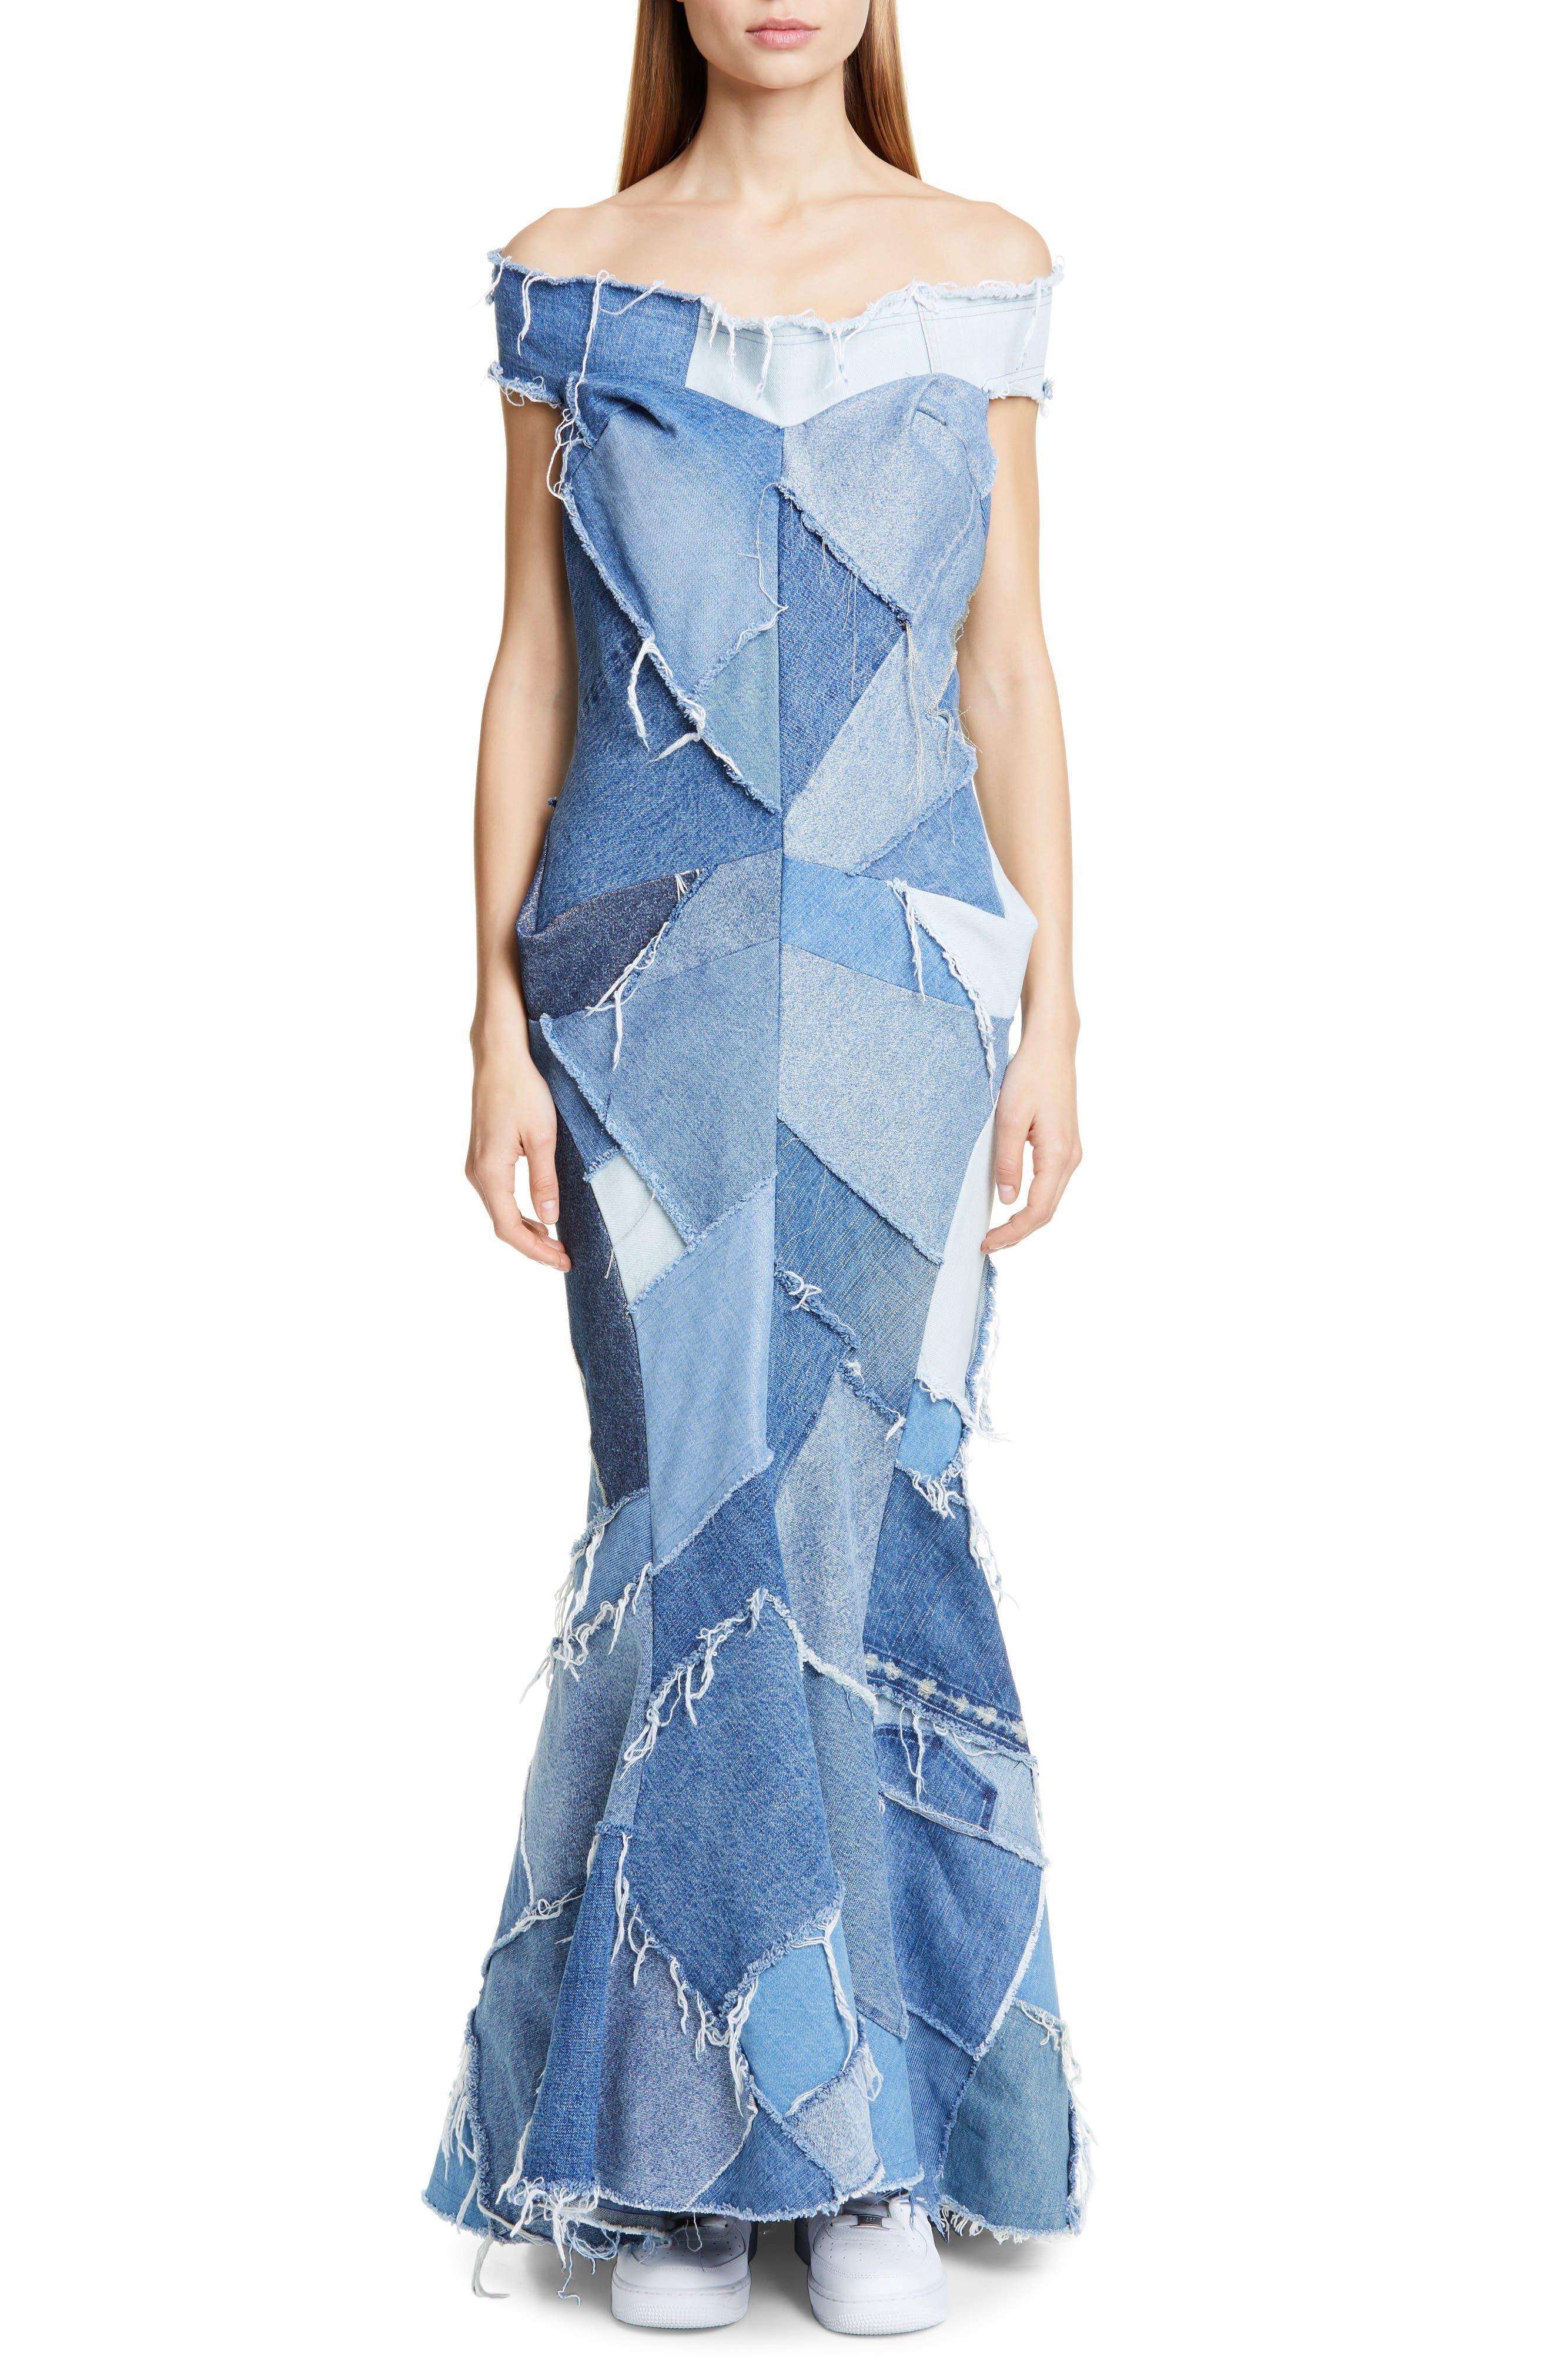 JUNYA WATANABE Denim Patchwork Off the Shoulder Mermaid Dress, Main, color, INDIGO